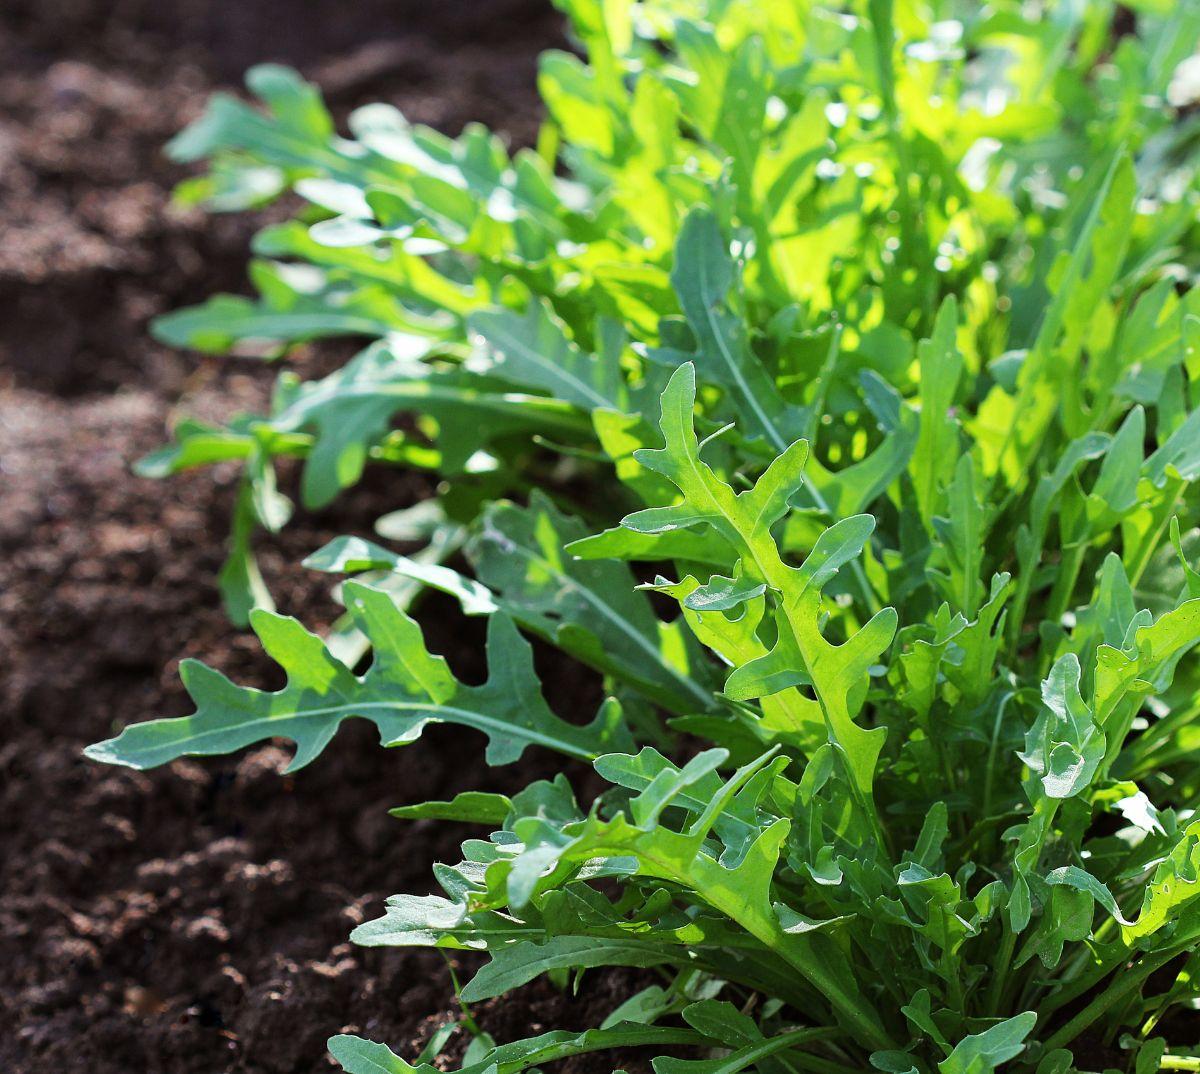 arugula plant growing in a vegetable garden